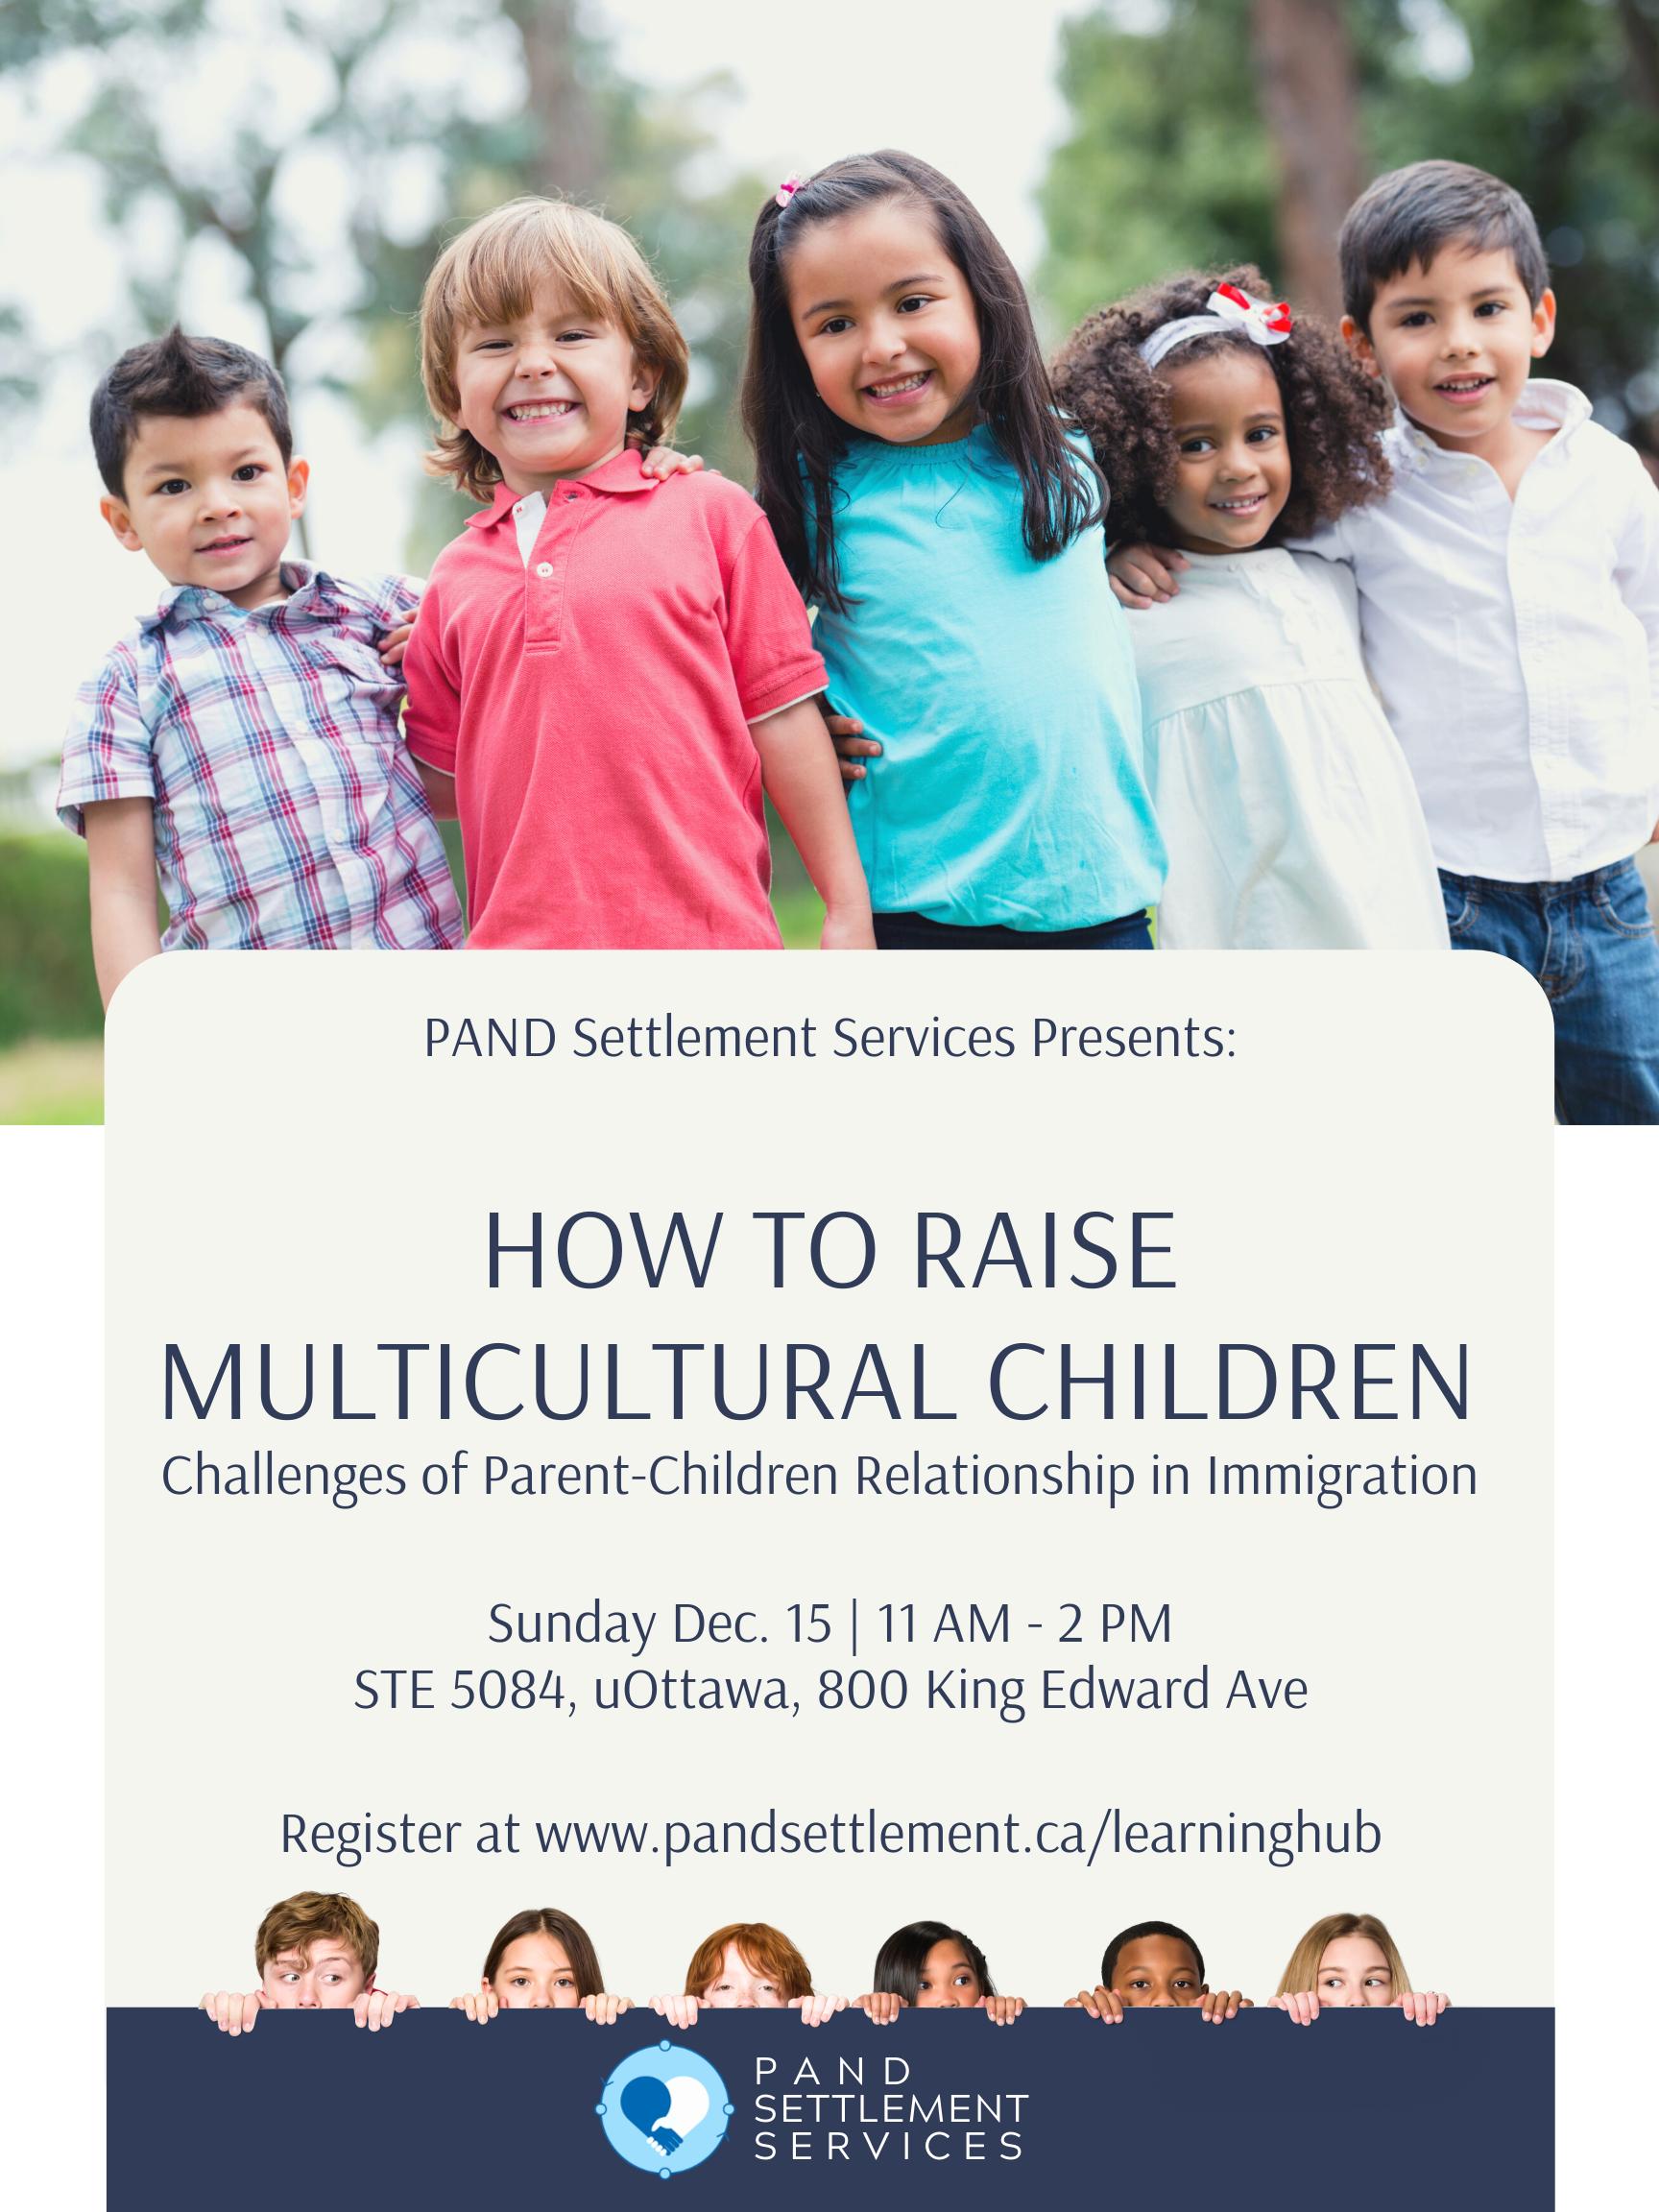 Raising Multicultural Children: Challenges of Parent-Children Relationship